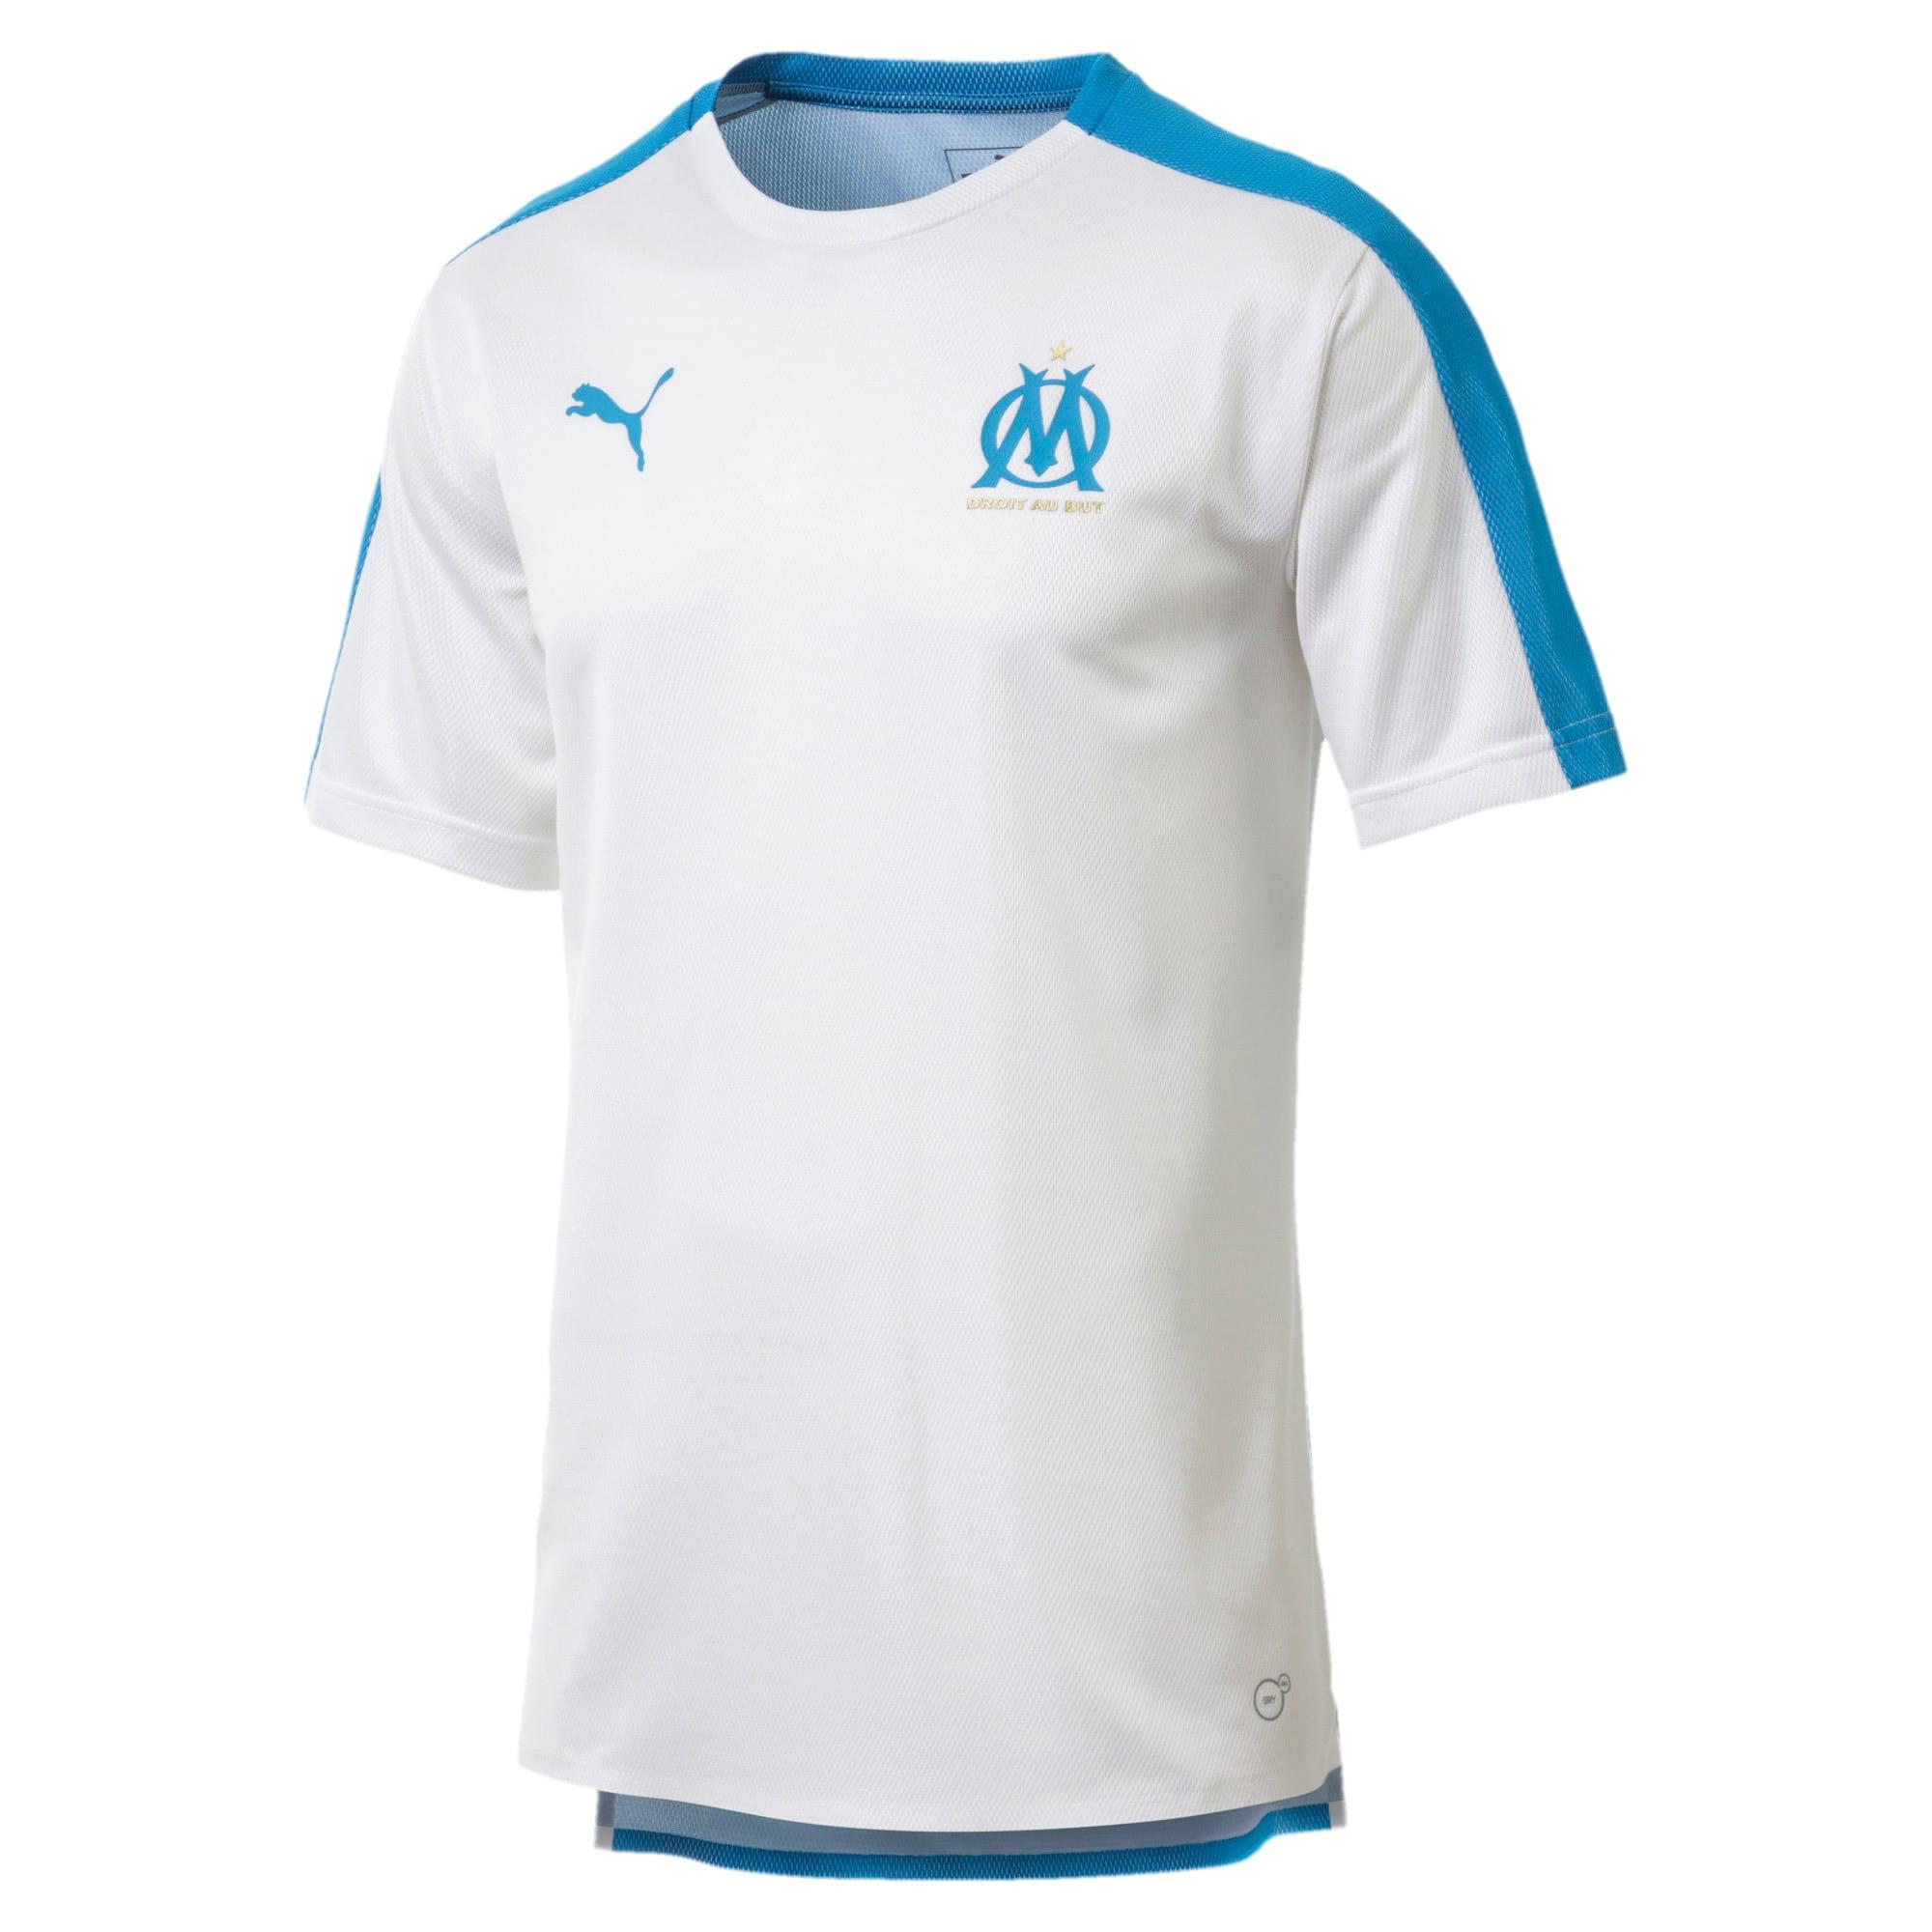 Thumbnail 1 of Olympique de Marseille Men's Stadium Jersey, Puma White-Bleu Azur, medium